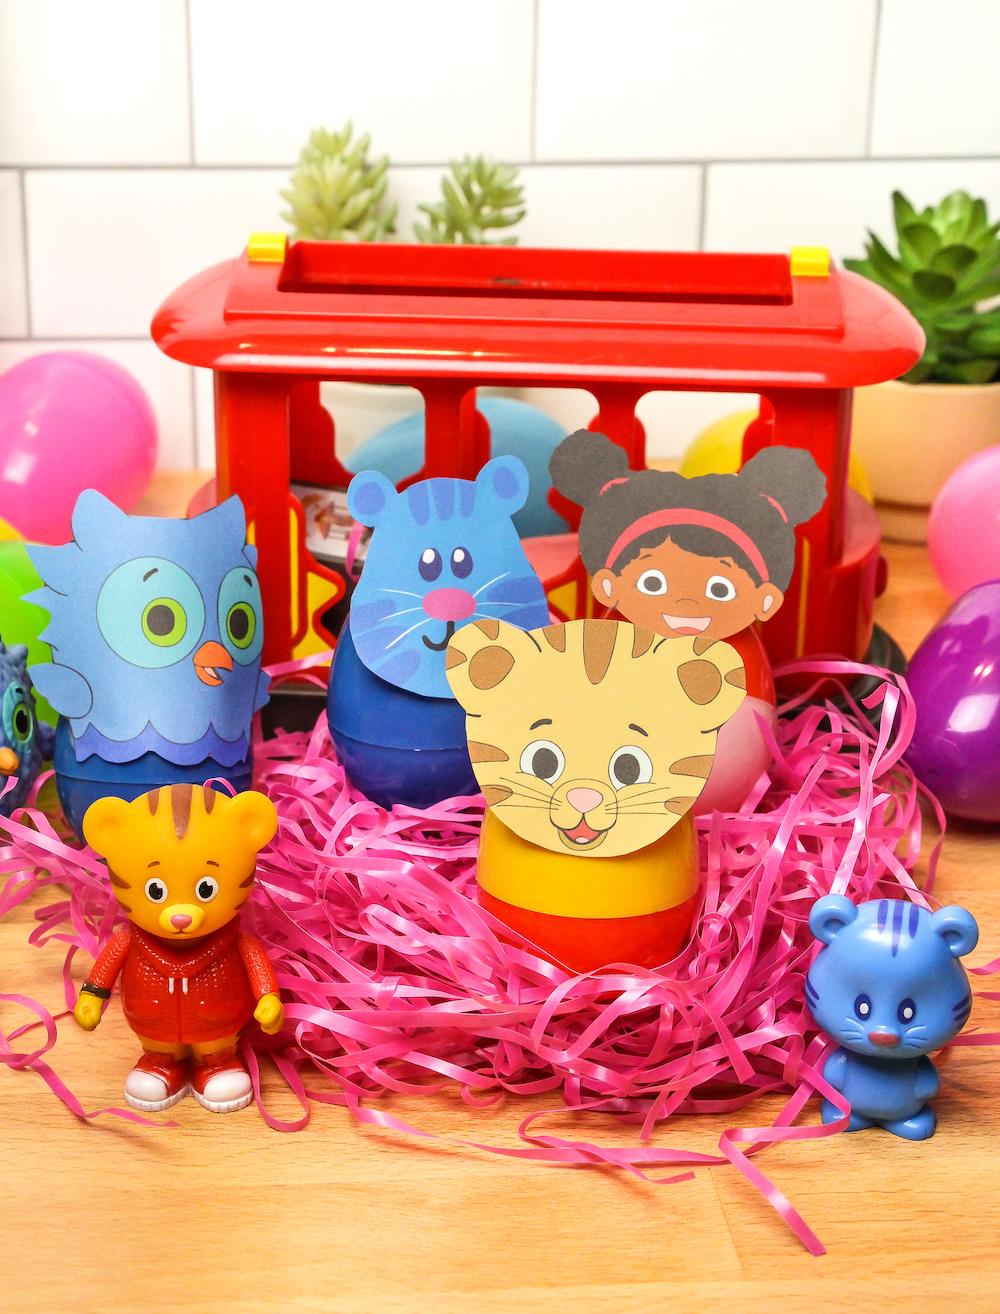 Daniel Tiger Easter Eggs Group photo